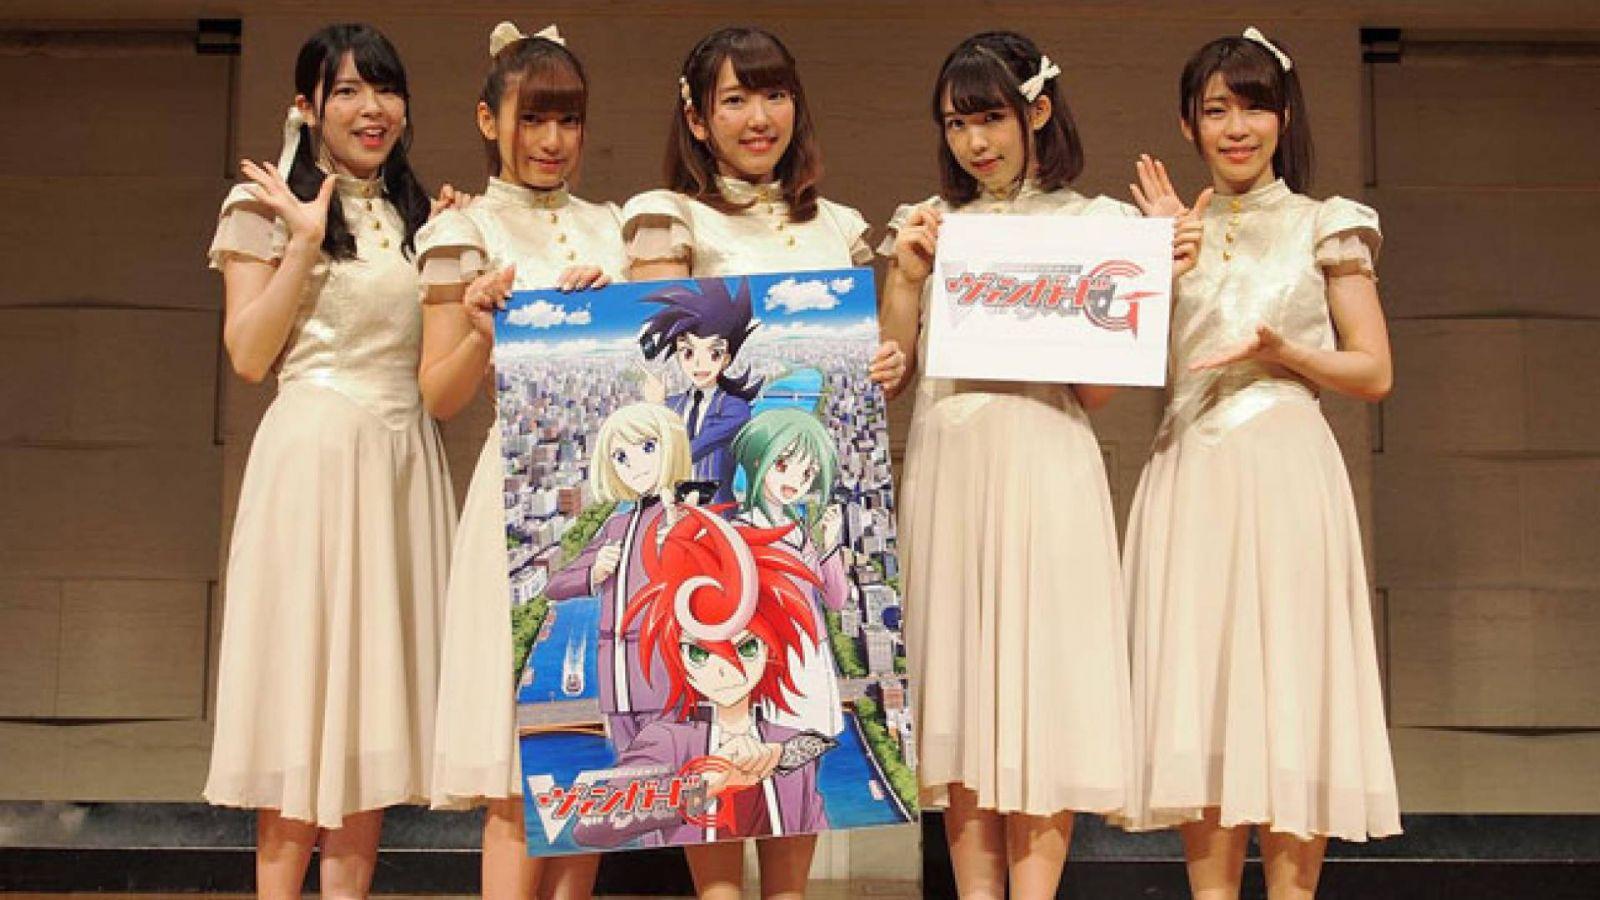 STARMARIE - Mekurumeku yuuki! © 2015 M-SMILE Co.,Ltd / brainsync,inc. All rights reserved.